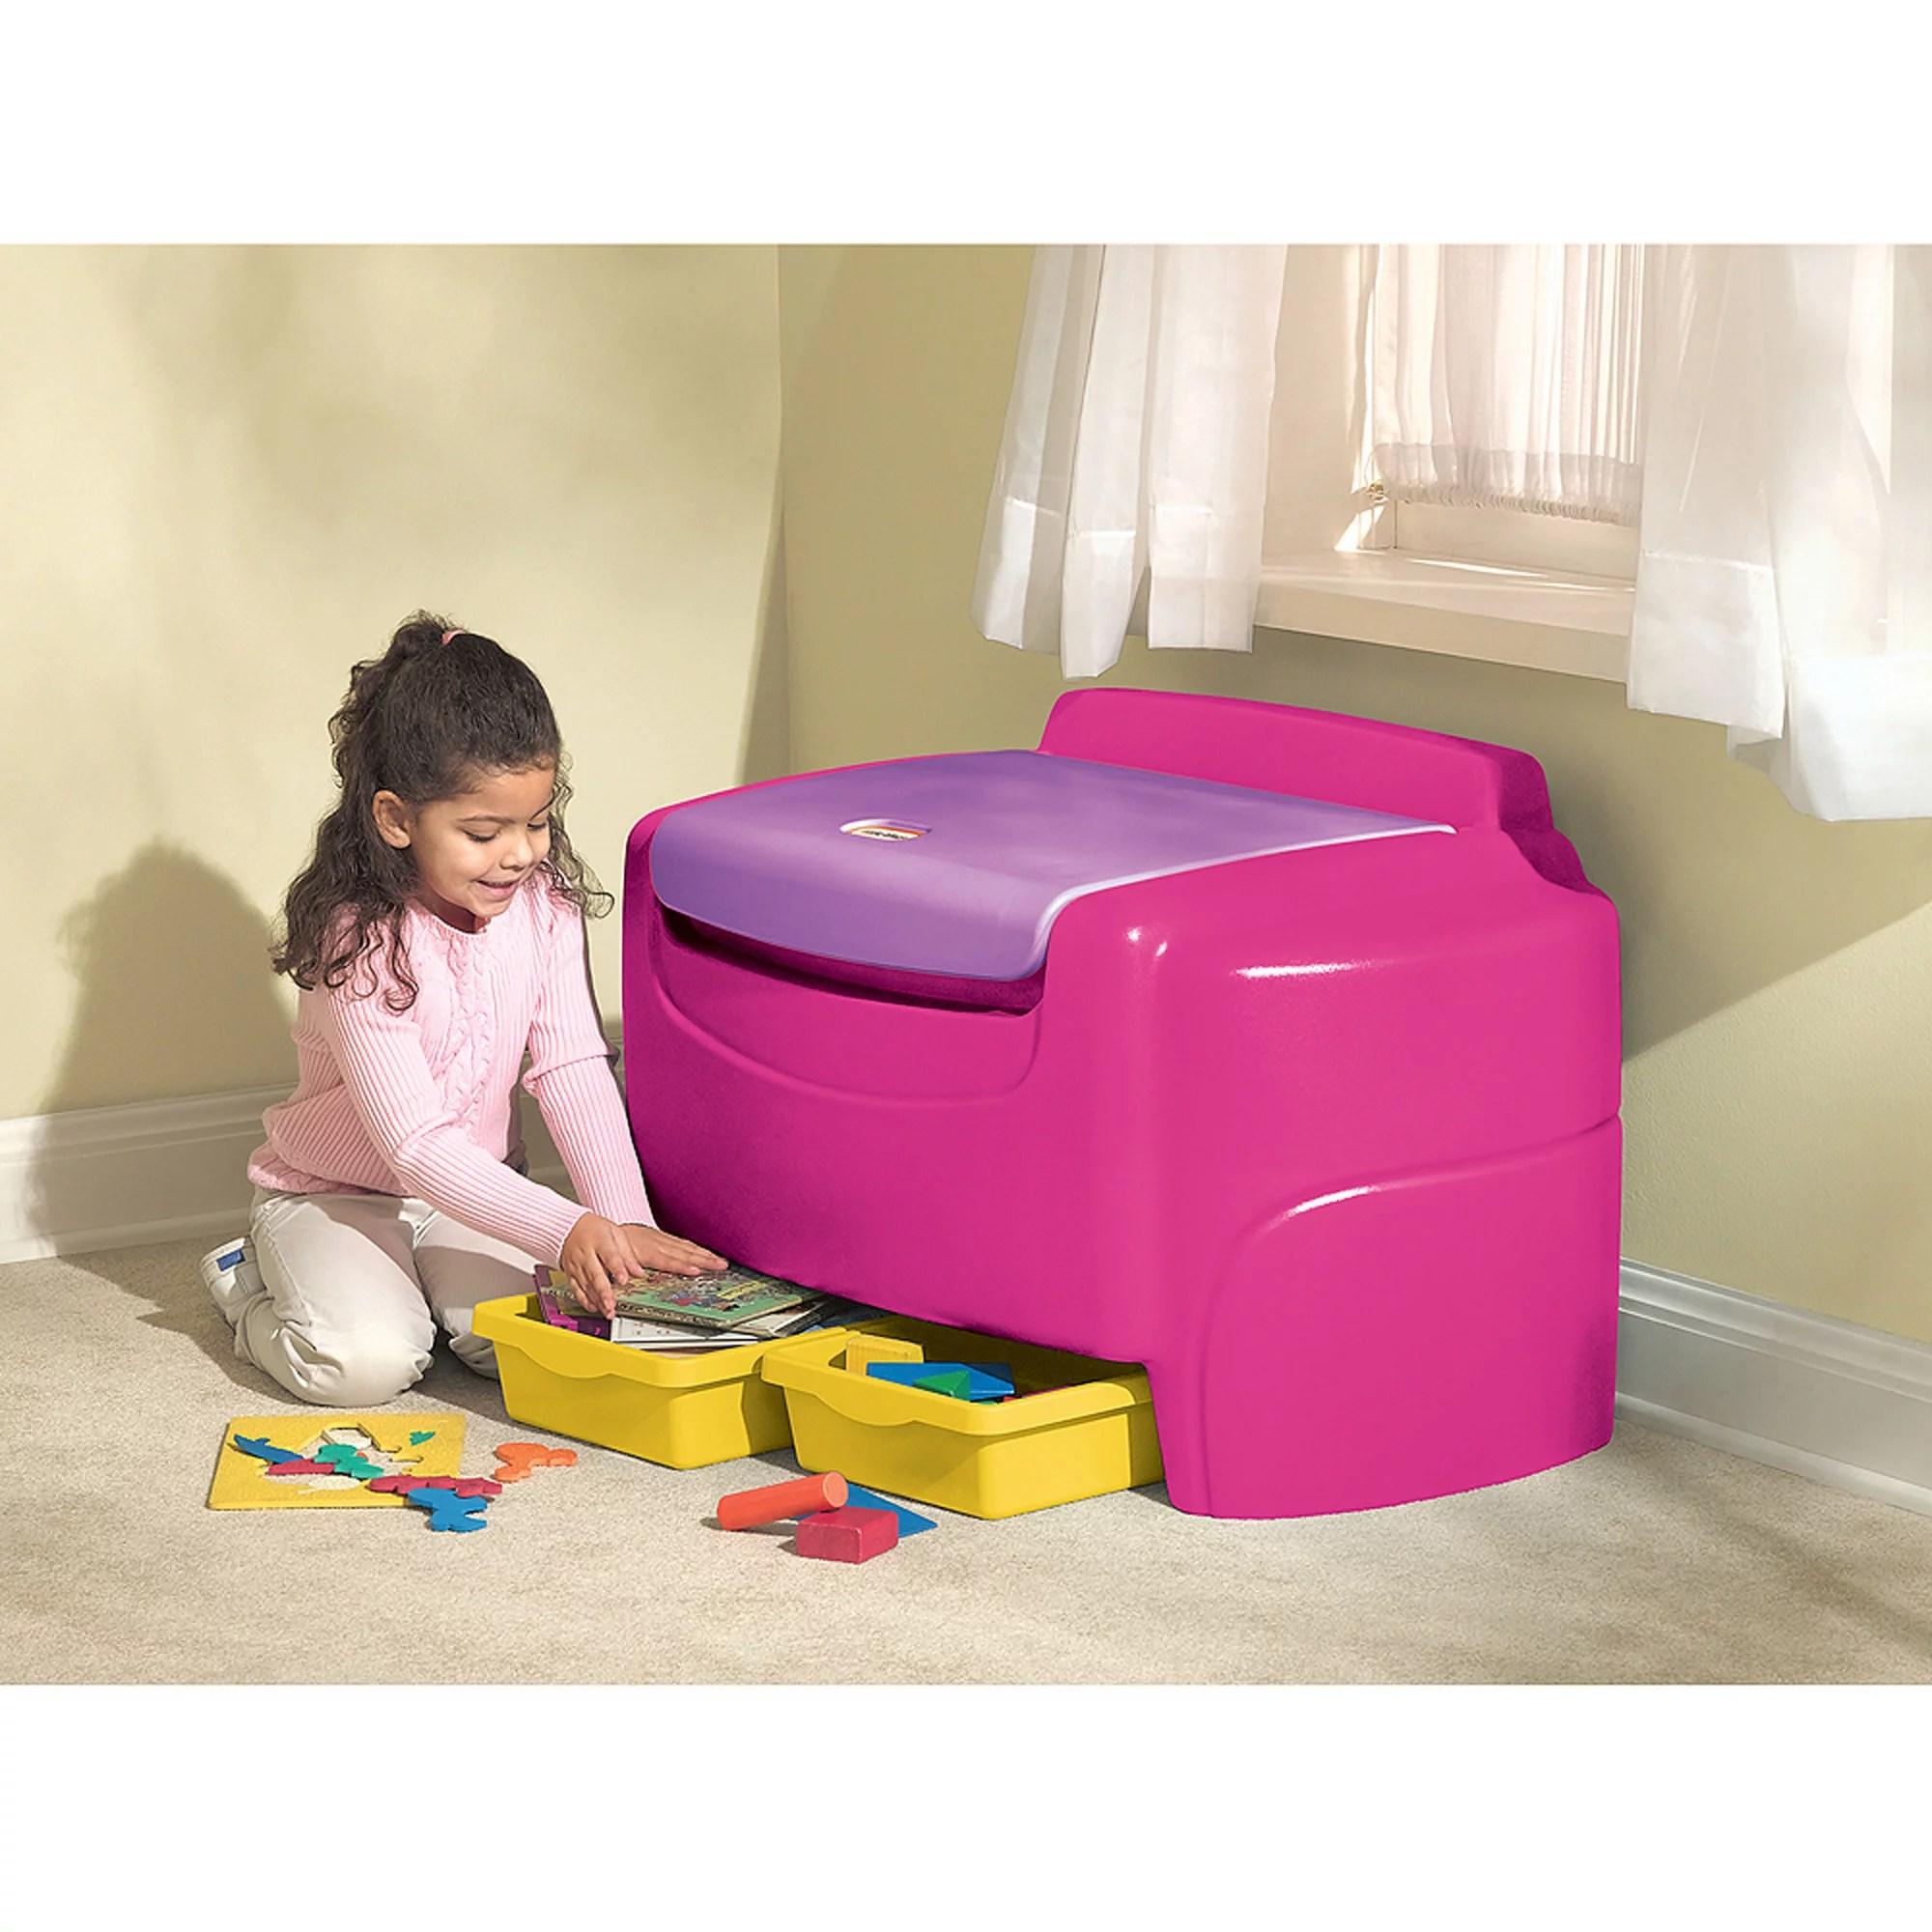 Little Tikes Bright Pink Sort N Store Toy Chest Walmart